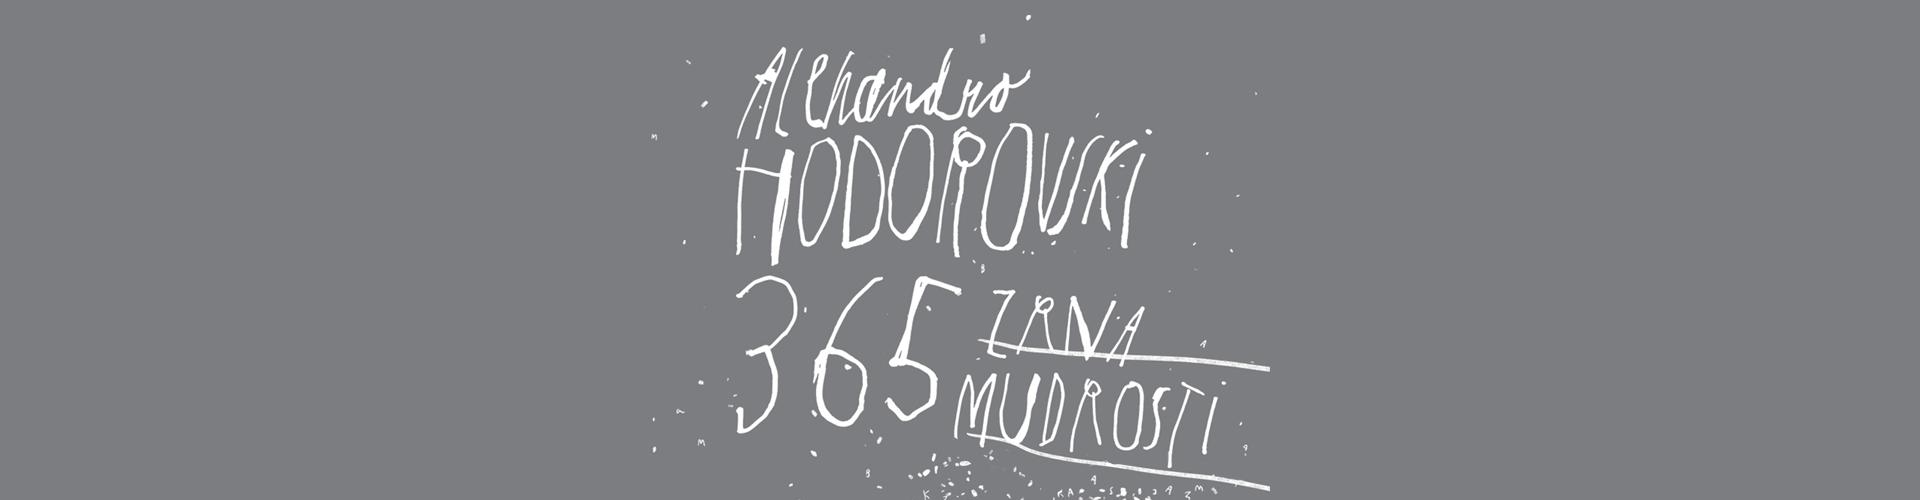 Alehandro Hodorovski